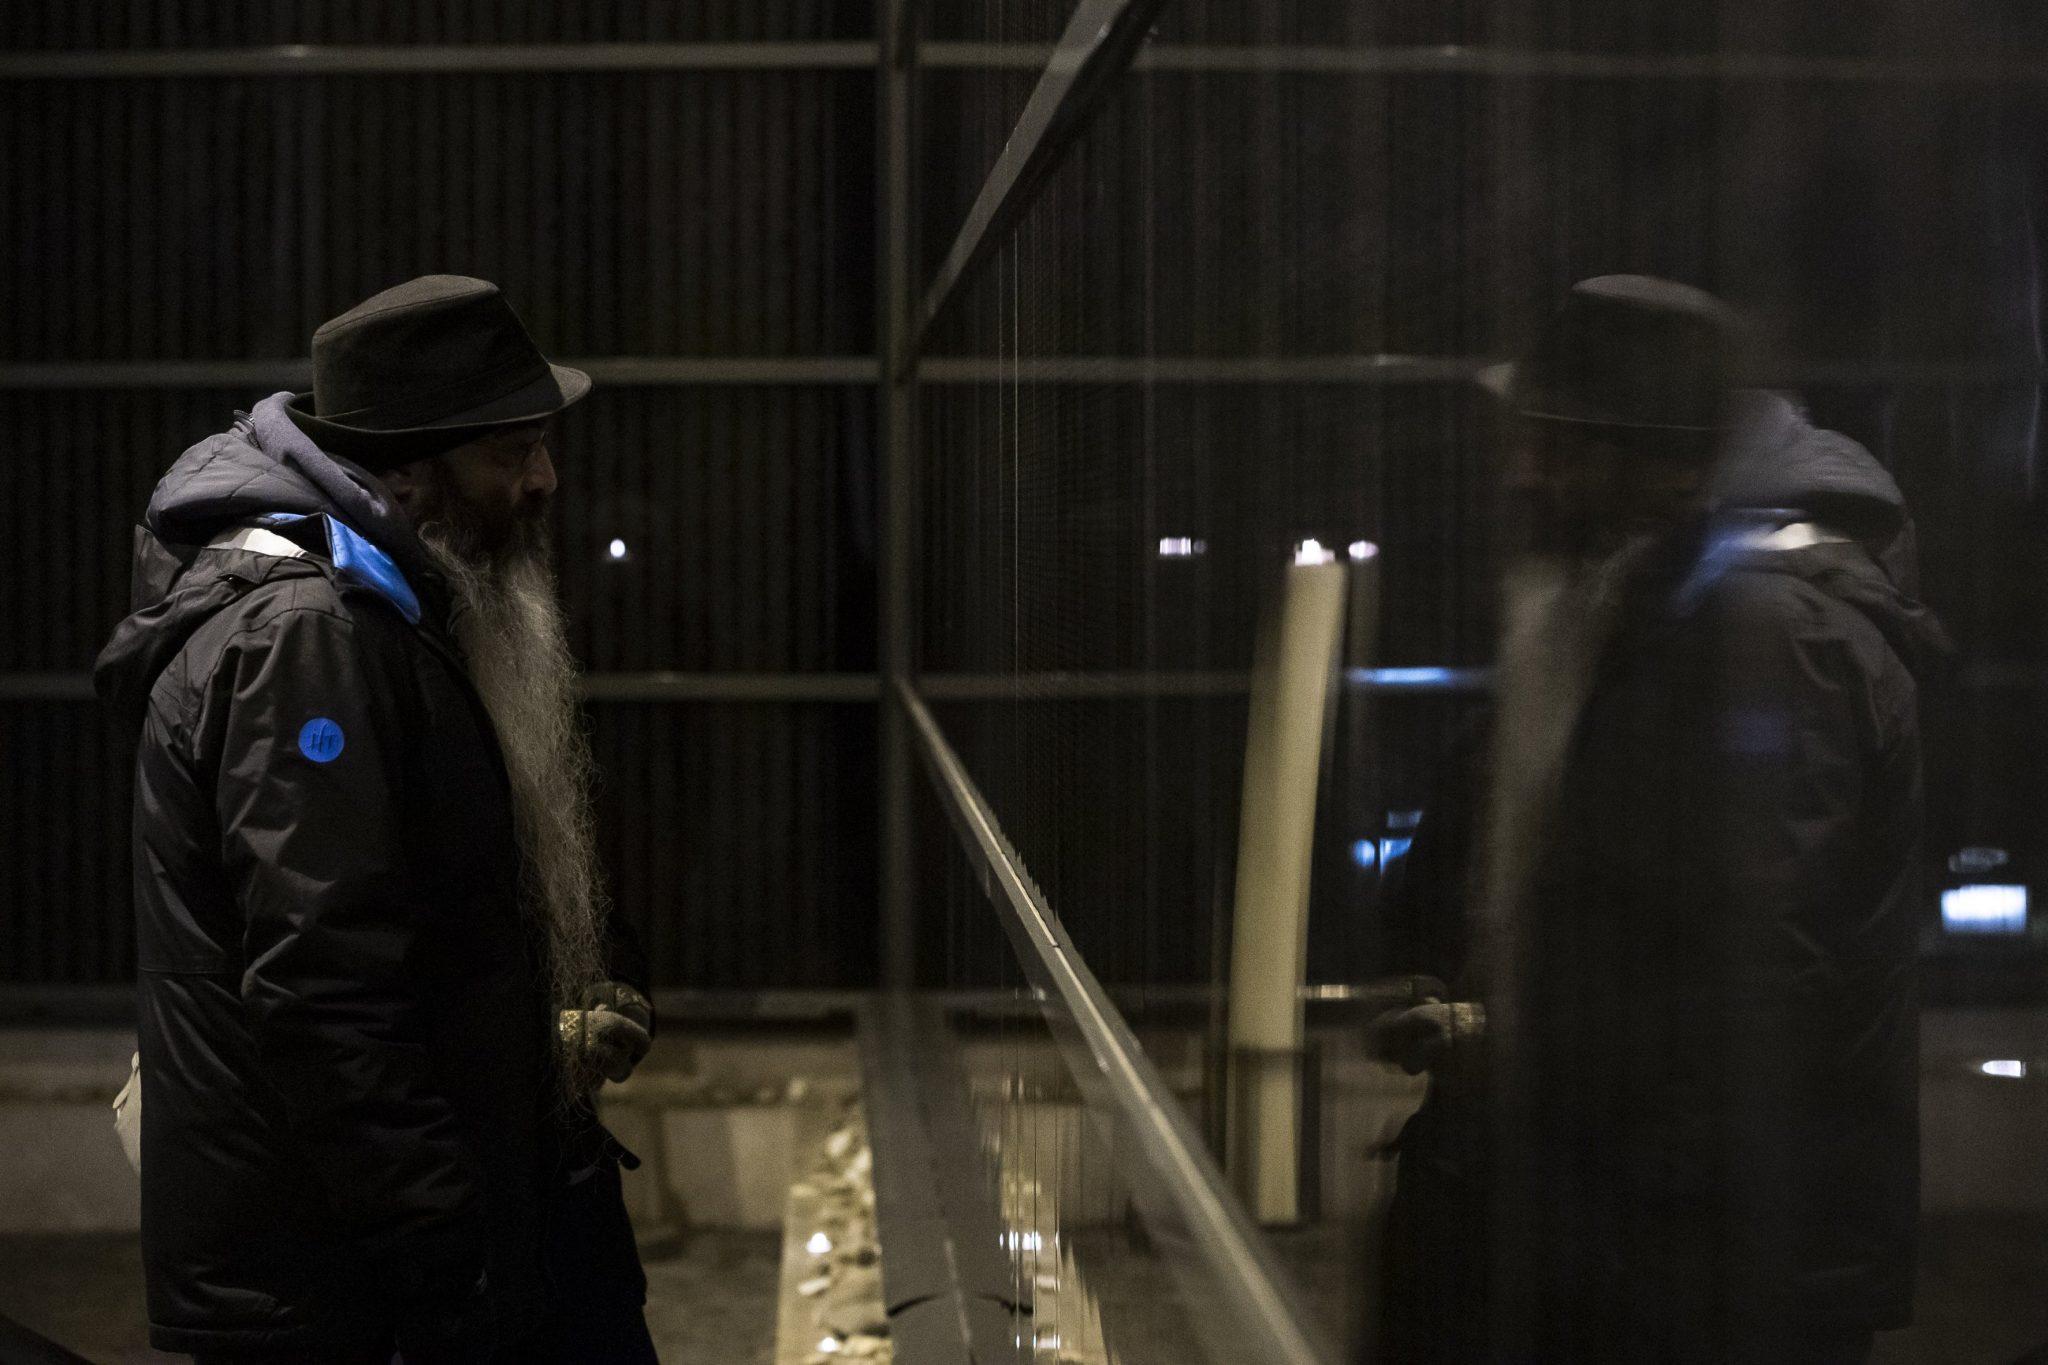 Holocaust commemoration